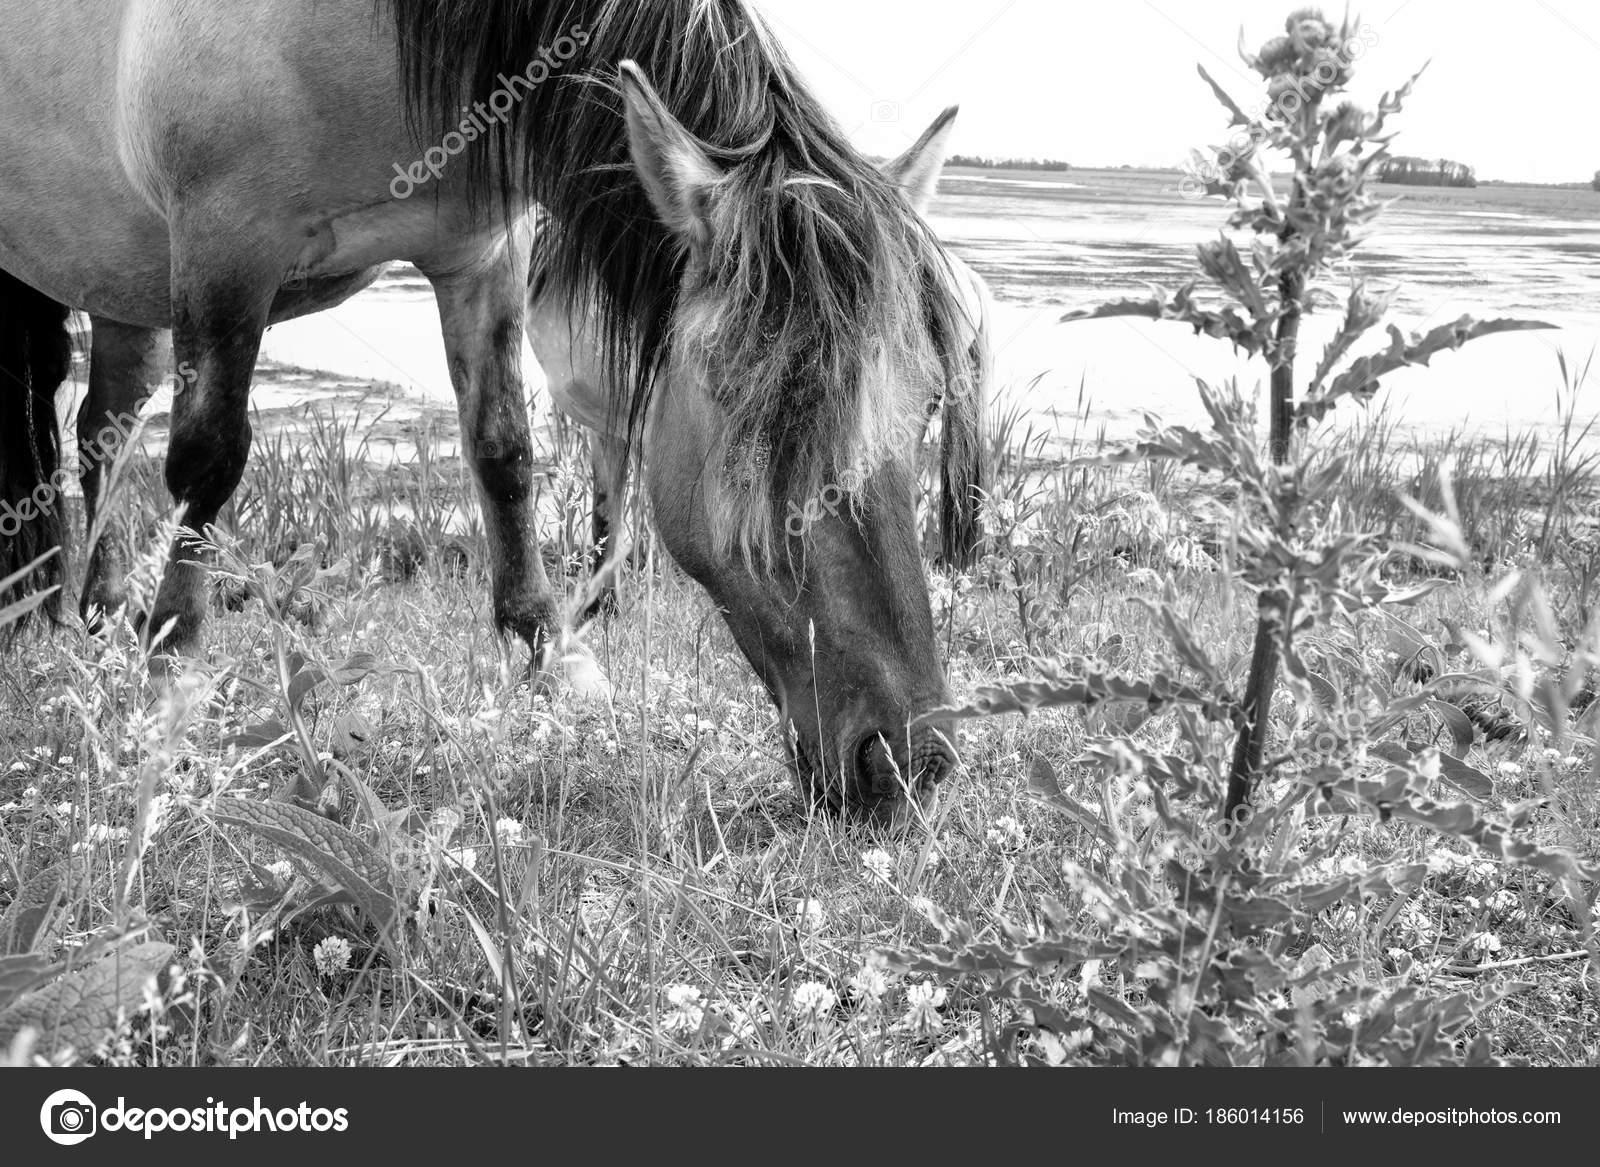 Wild Horses Black And White European Wild Horses In Black And White Stock Photo C Bjorn999 186014156